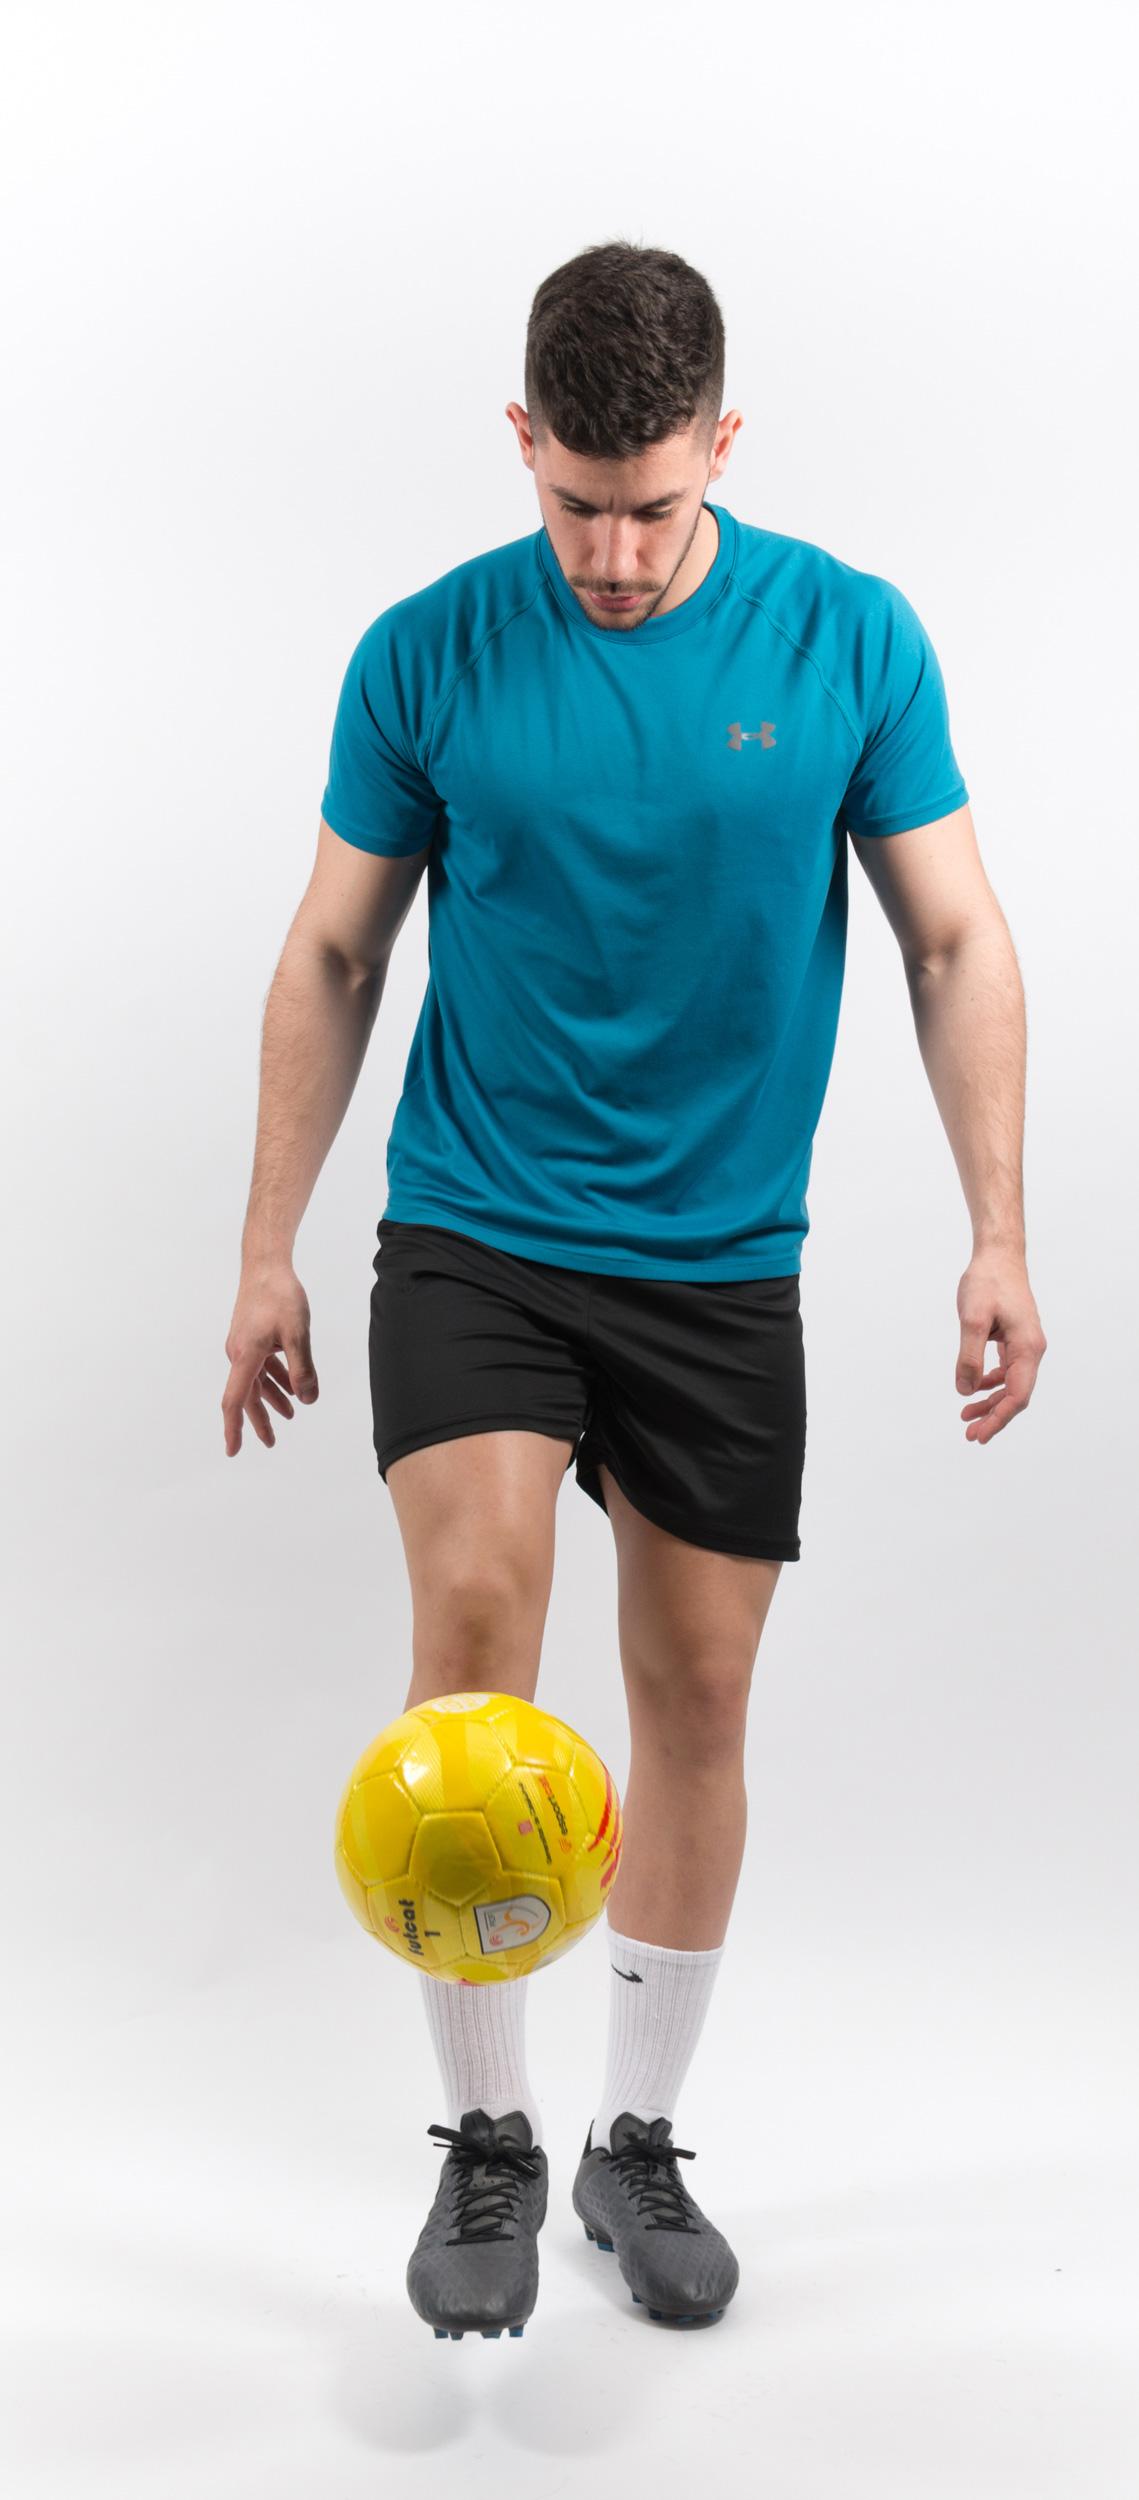 Futbol, fisioterapia deportiva